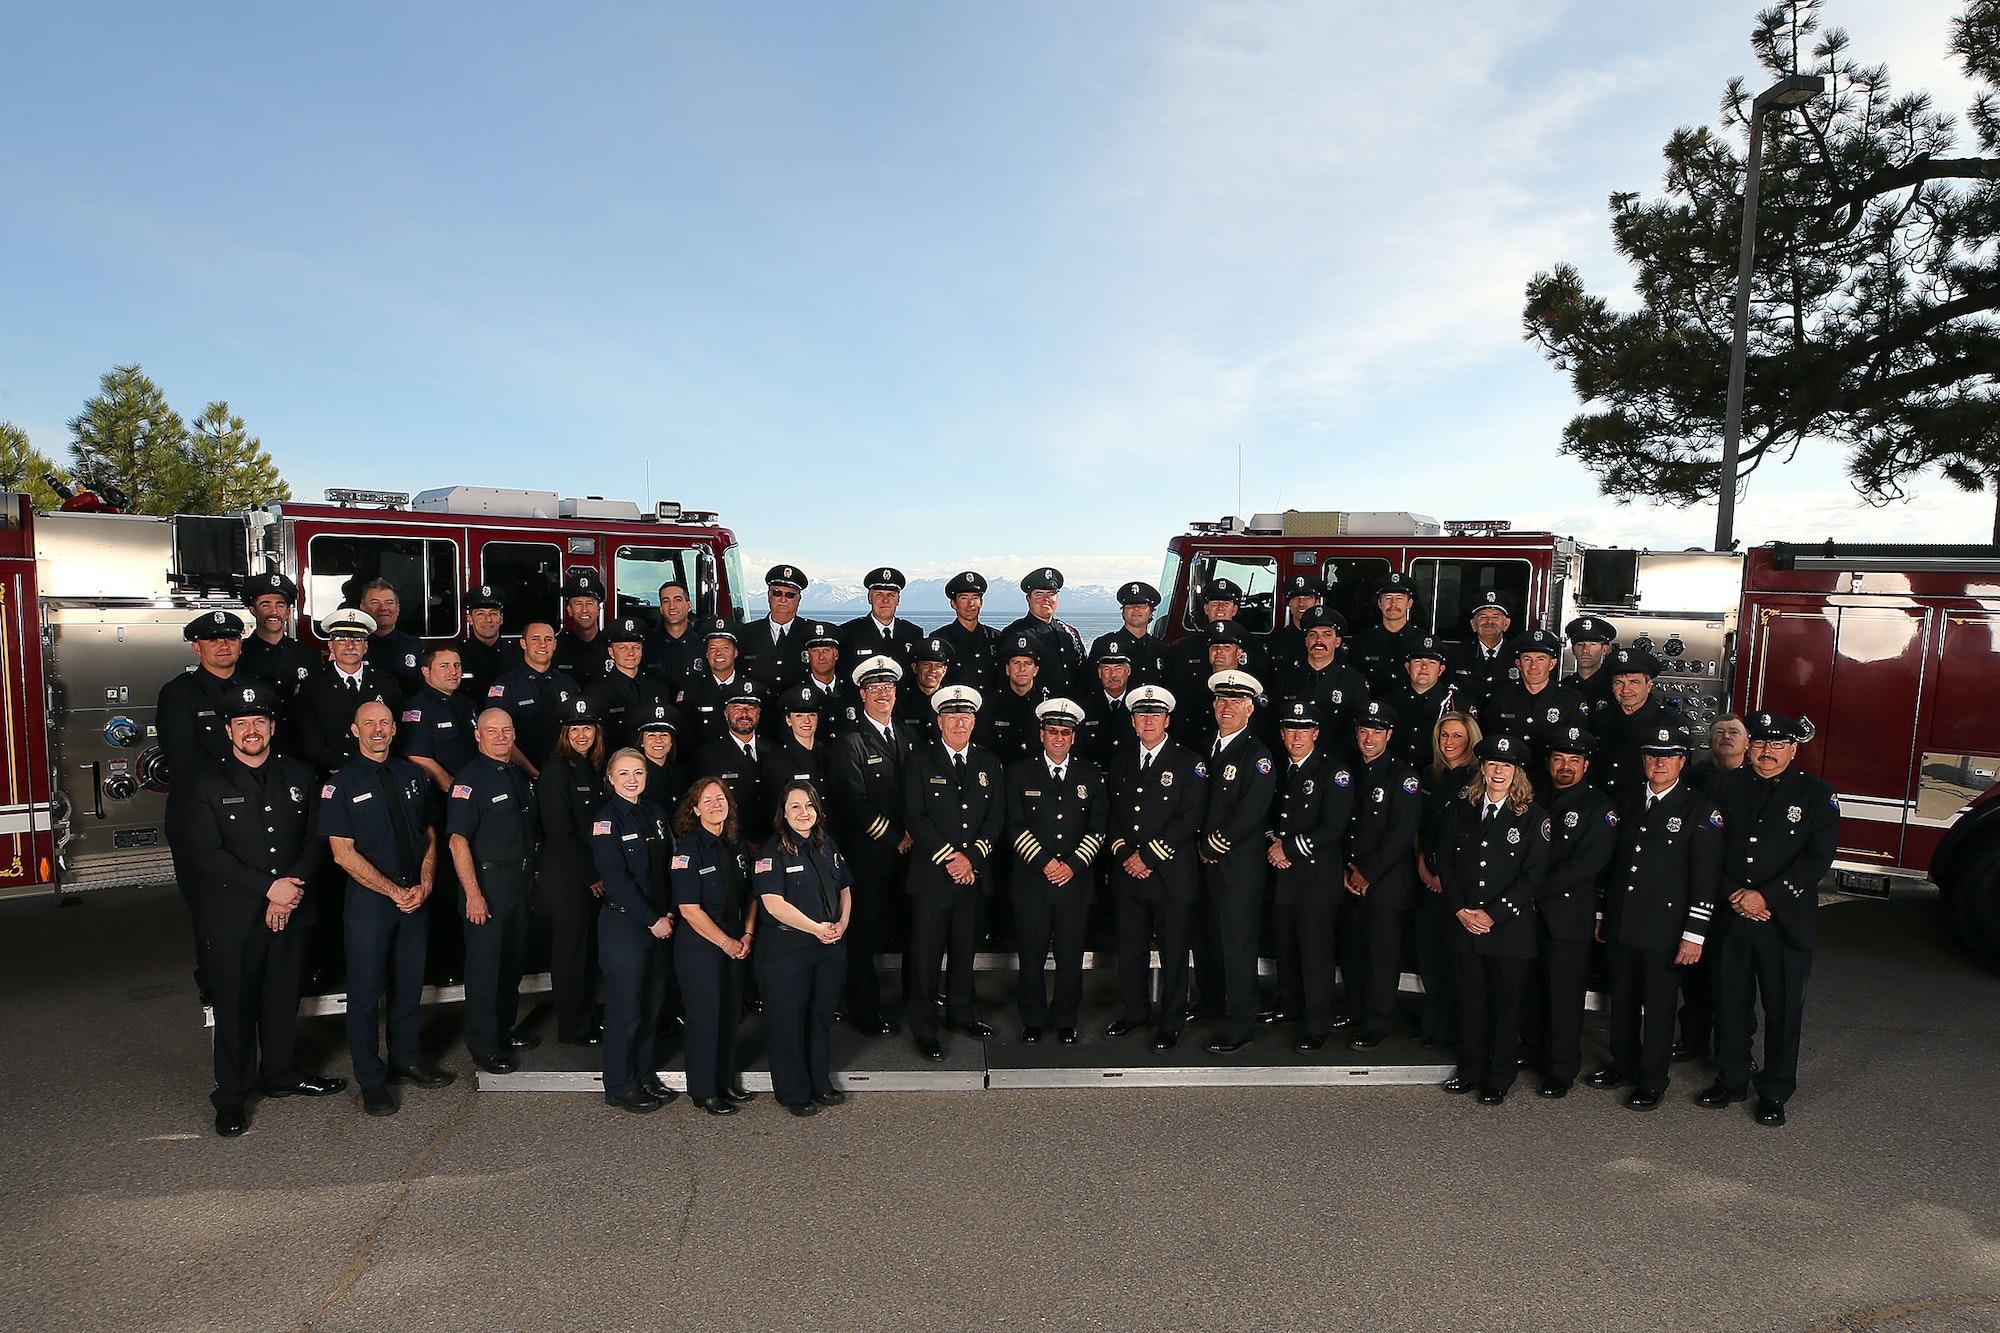 Fire staff in uniforms